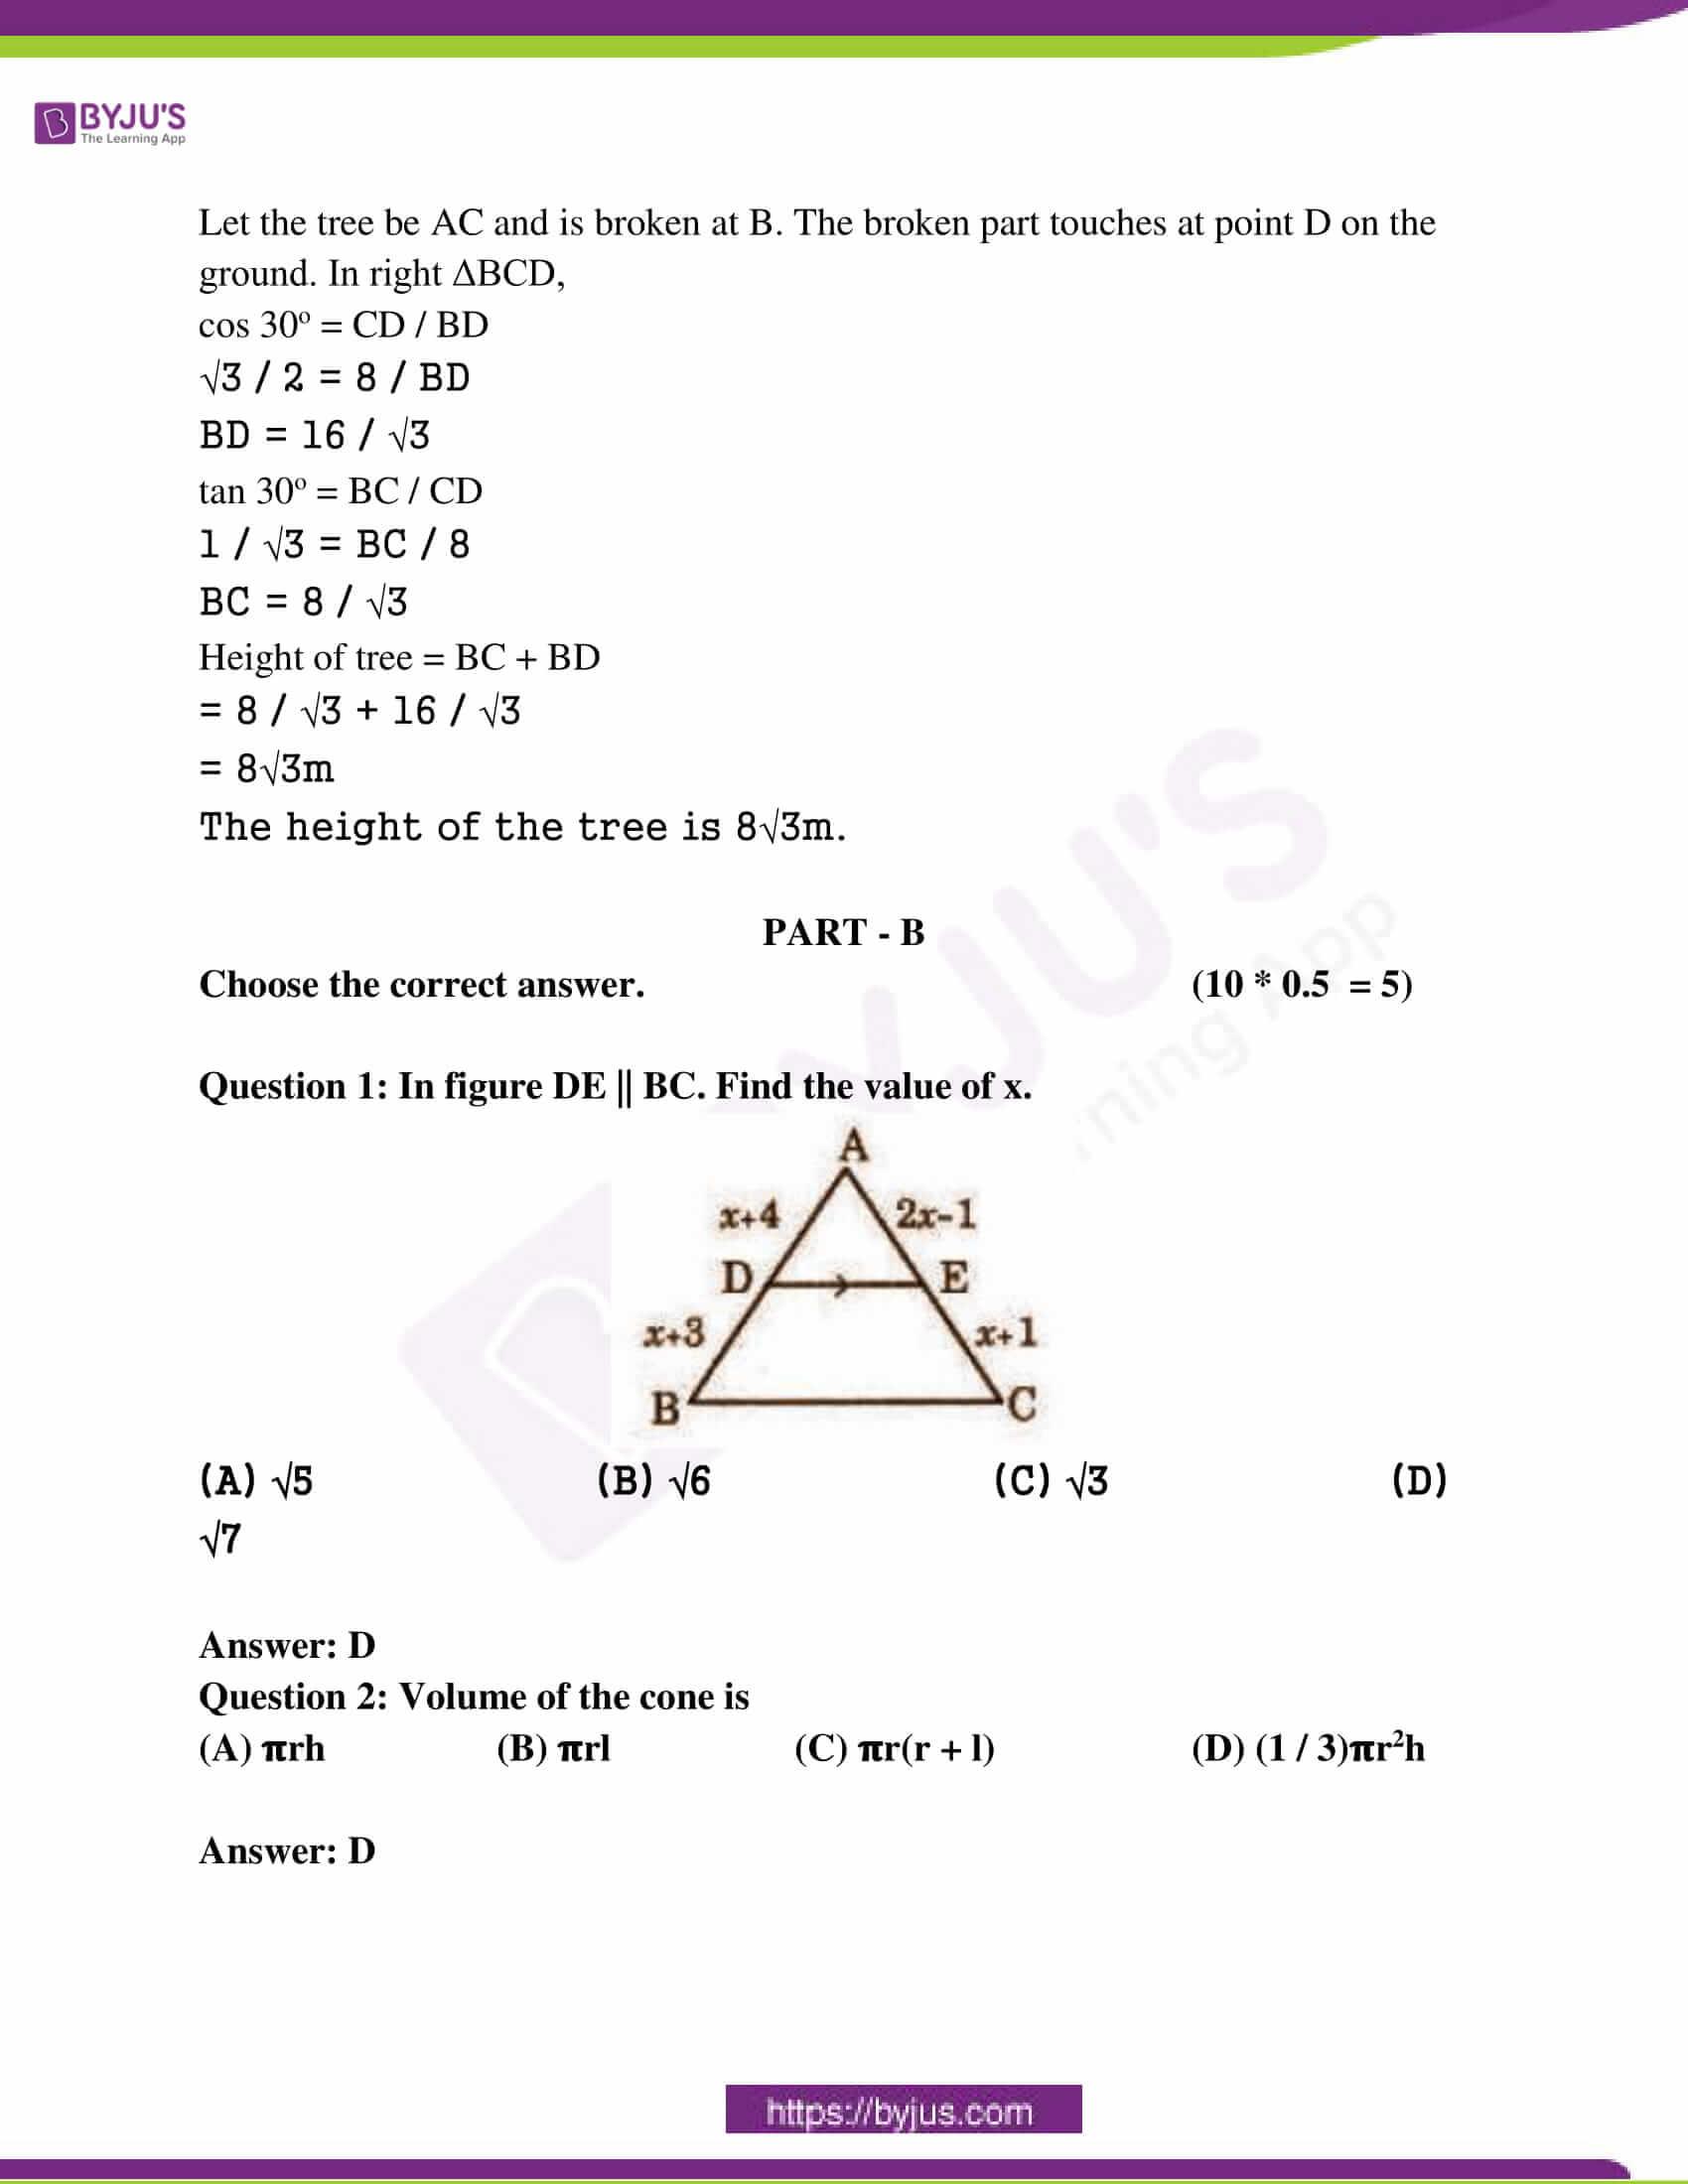 ap class 10 maths question paper 2 sol march 2016 15